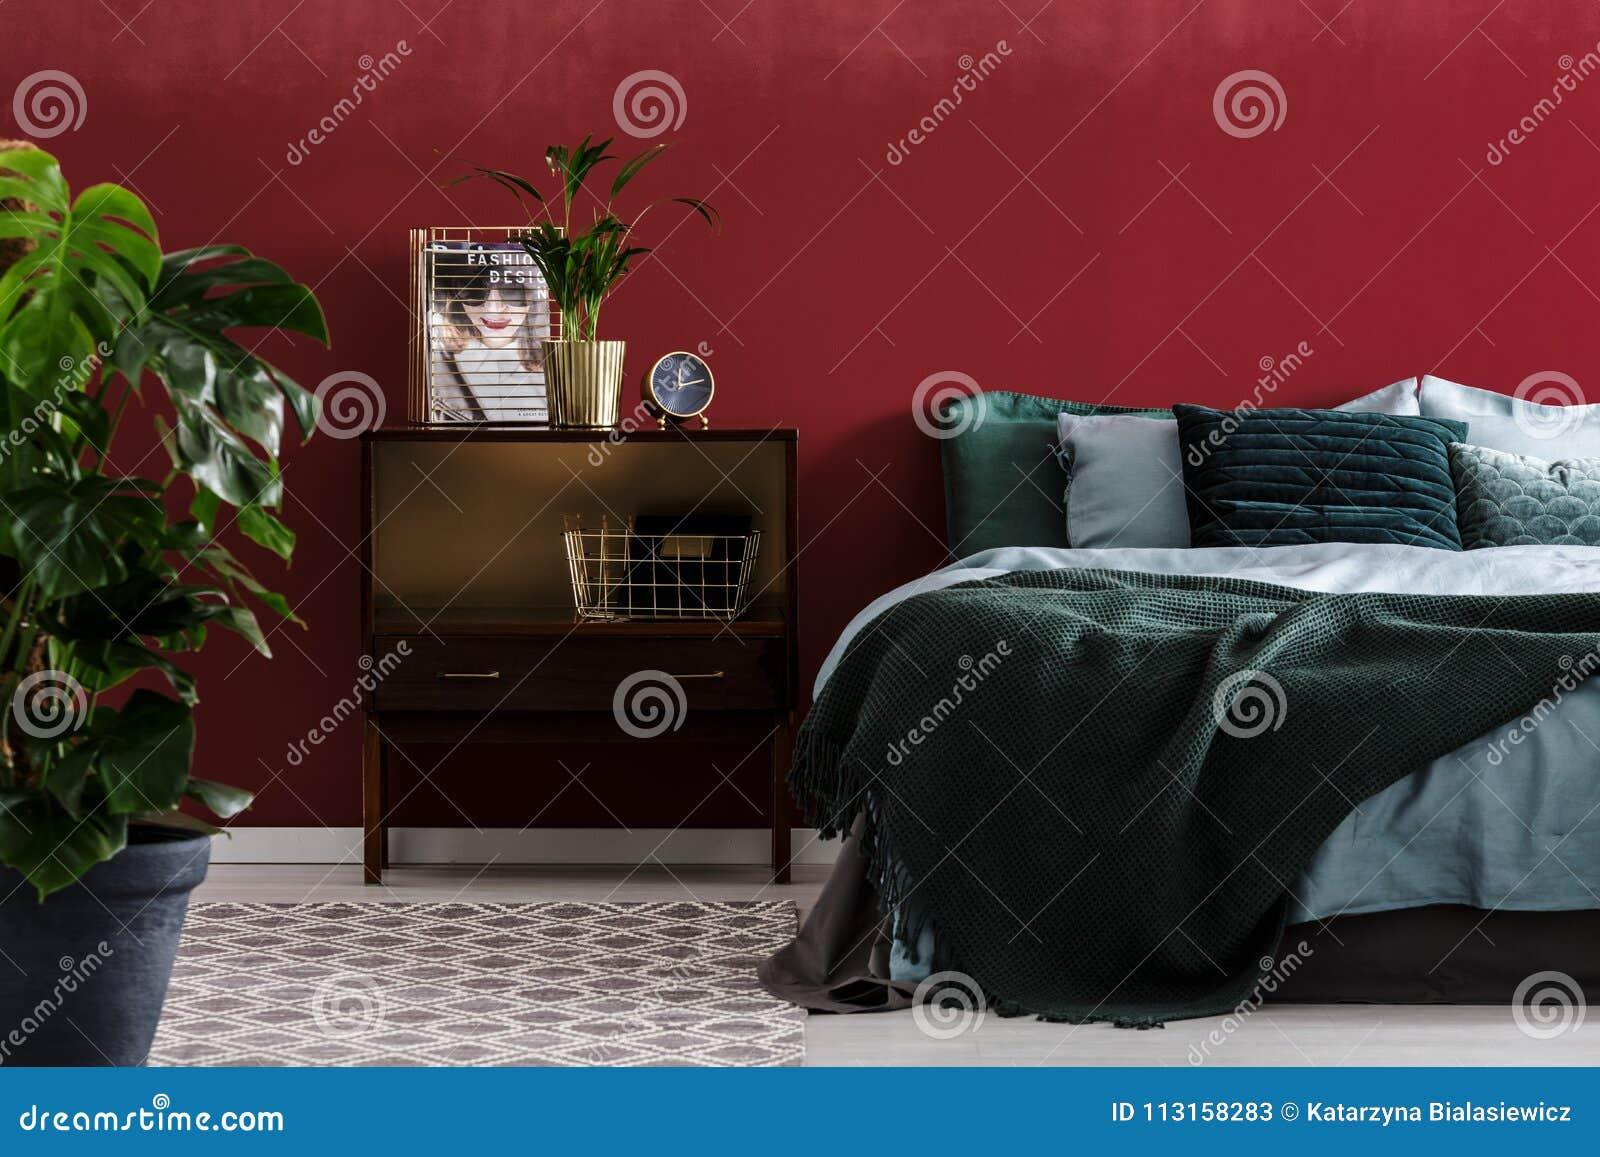 Dark Red Bedroom Interior Stock Image Image Of Cushion 113158283